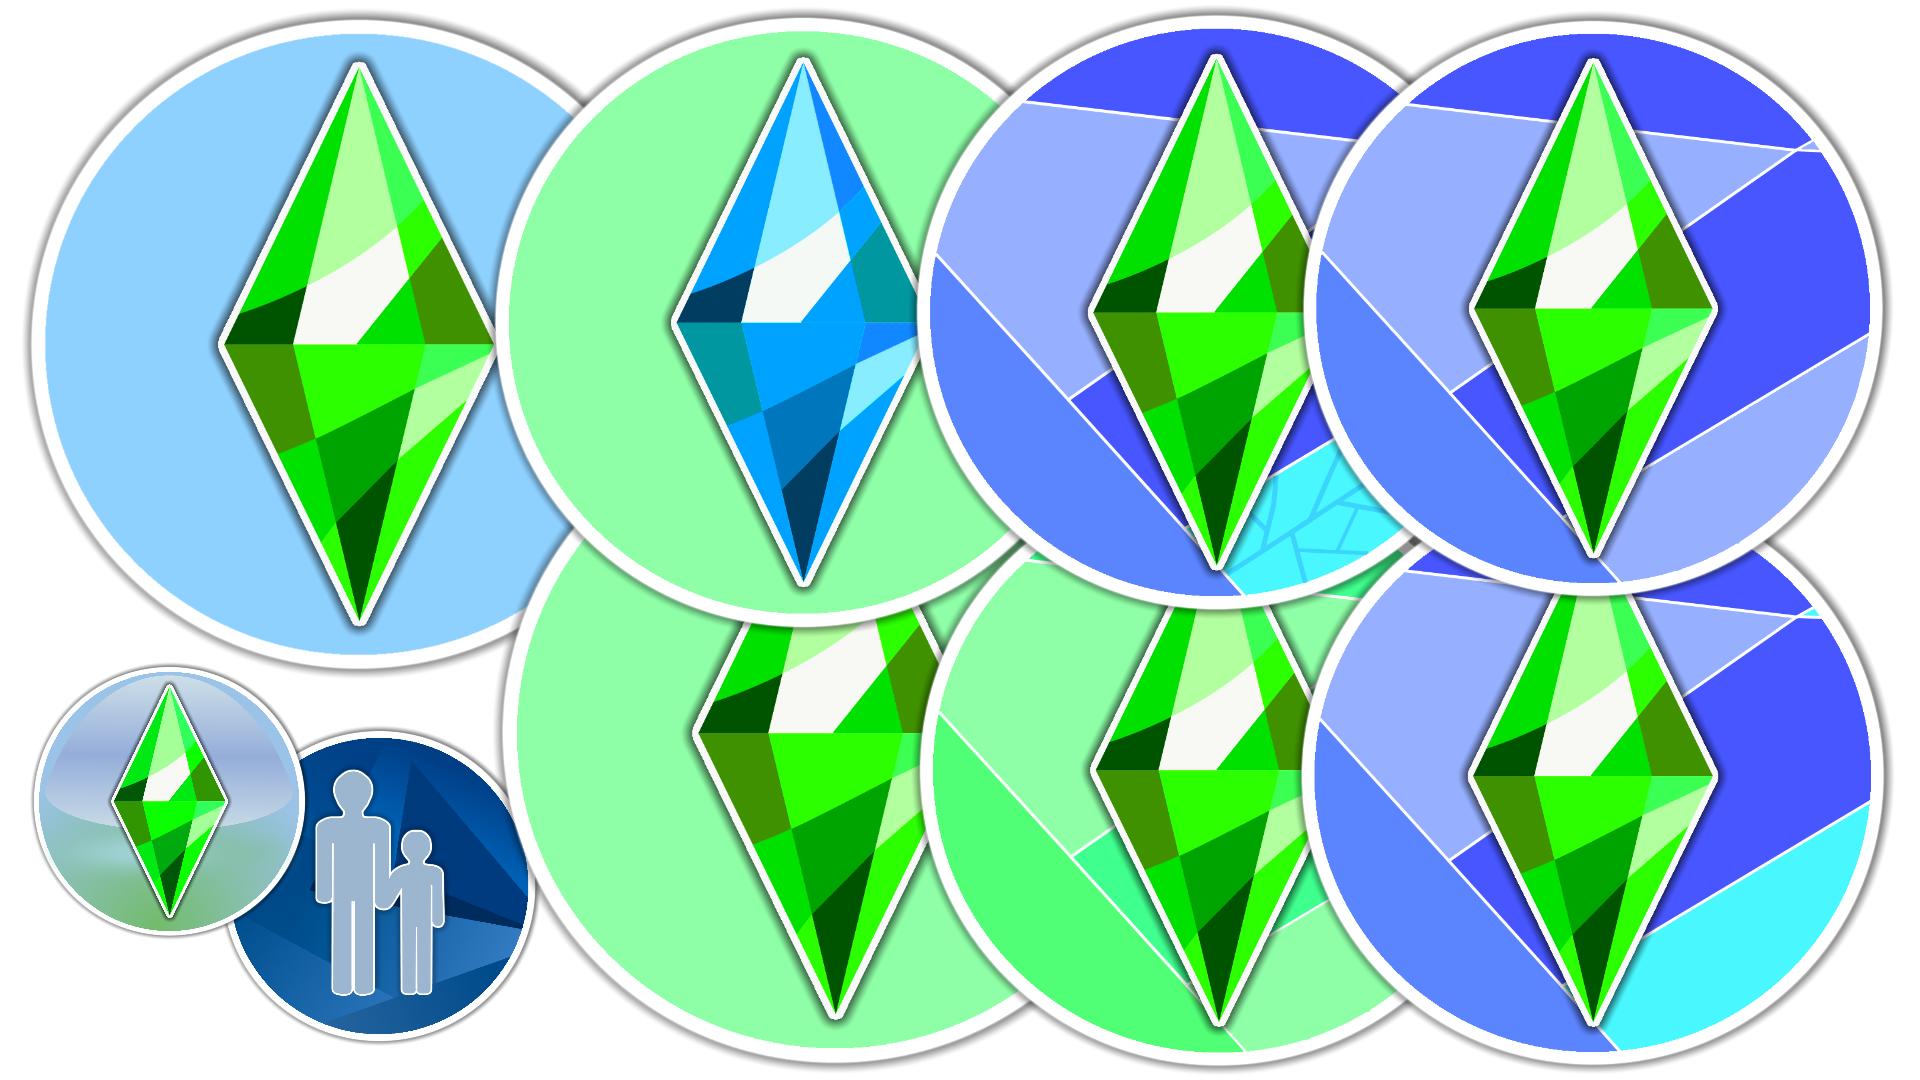 Sims 4 Desktop Icons New Branding Desktop Icons Sims 4 Icon